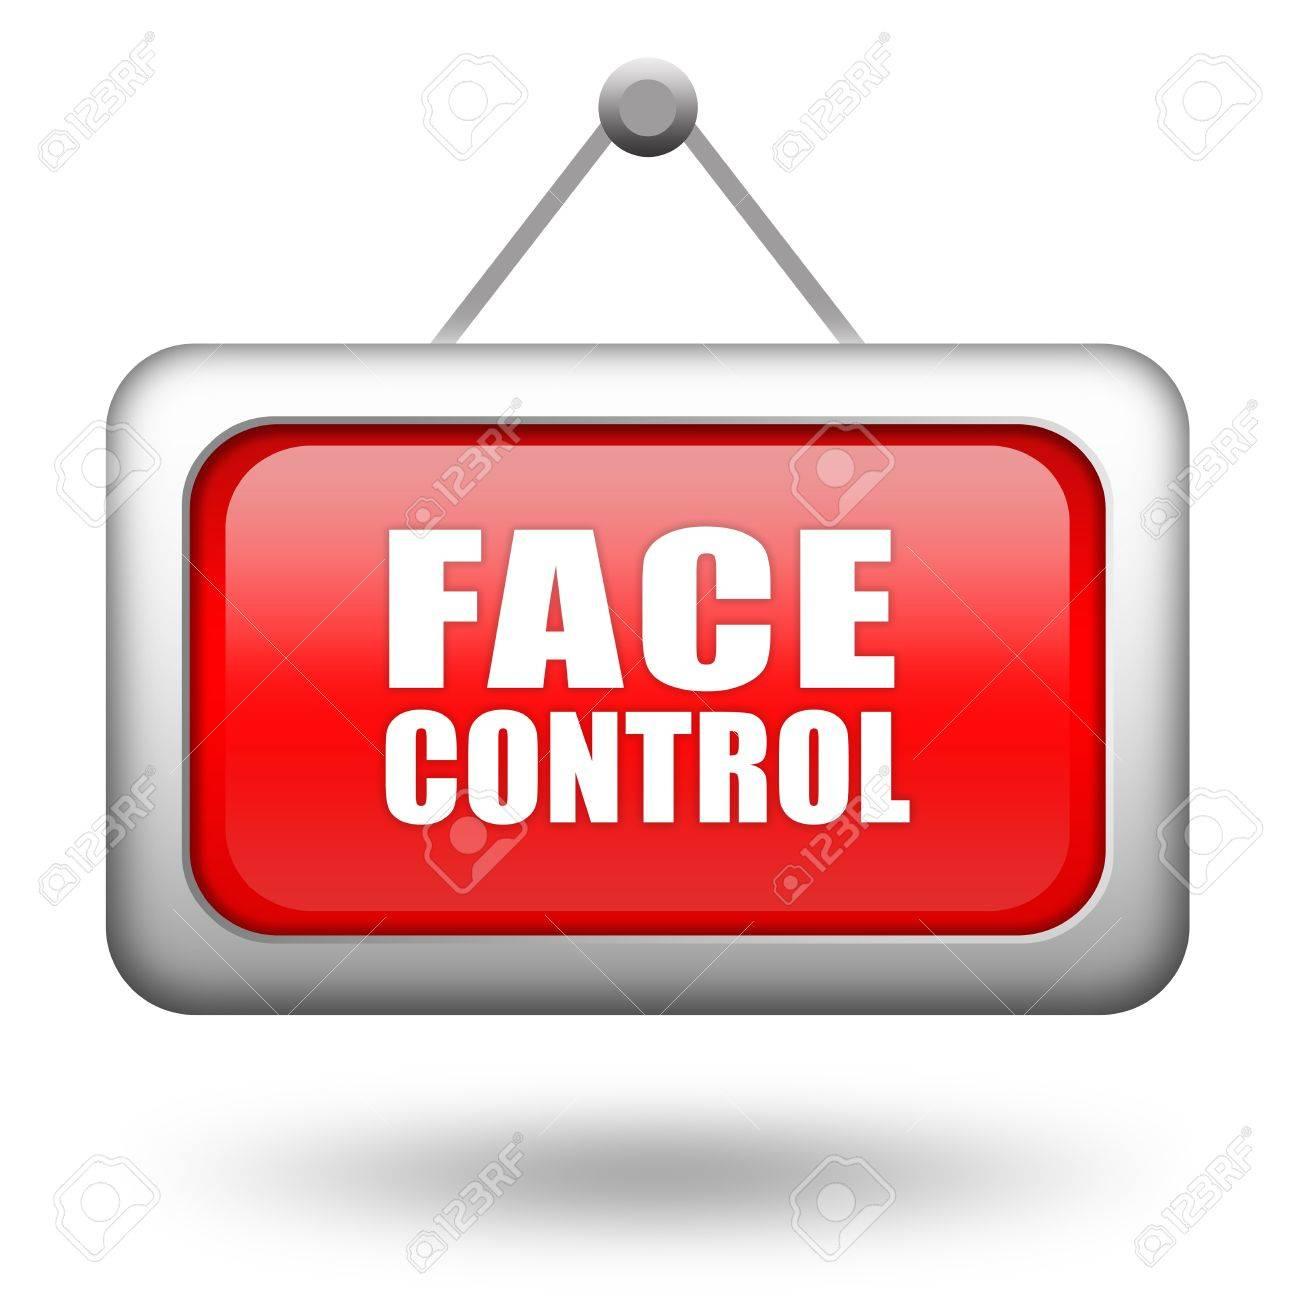 Face control sign Stock Photo - 12414769